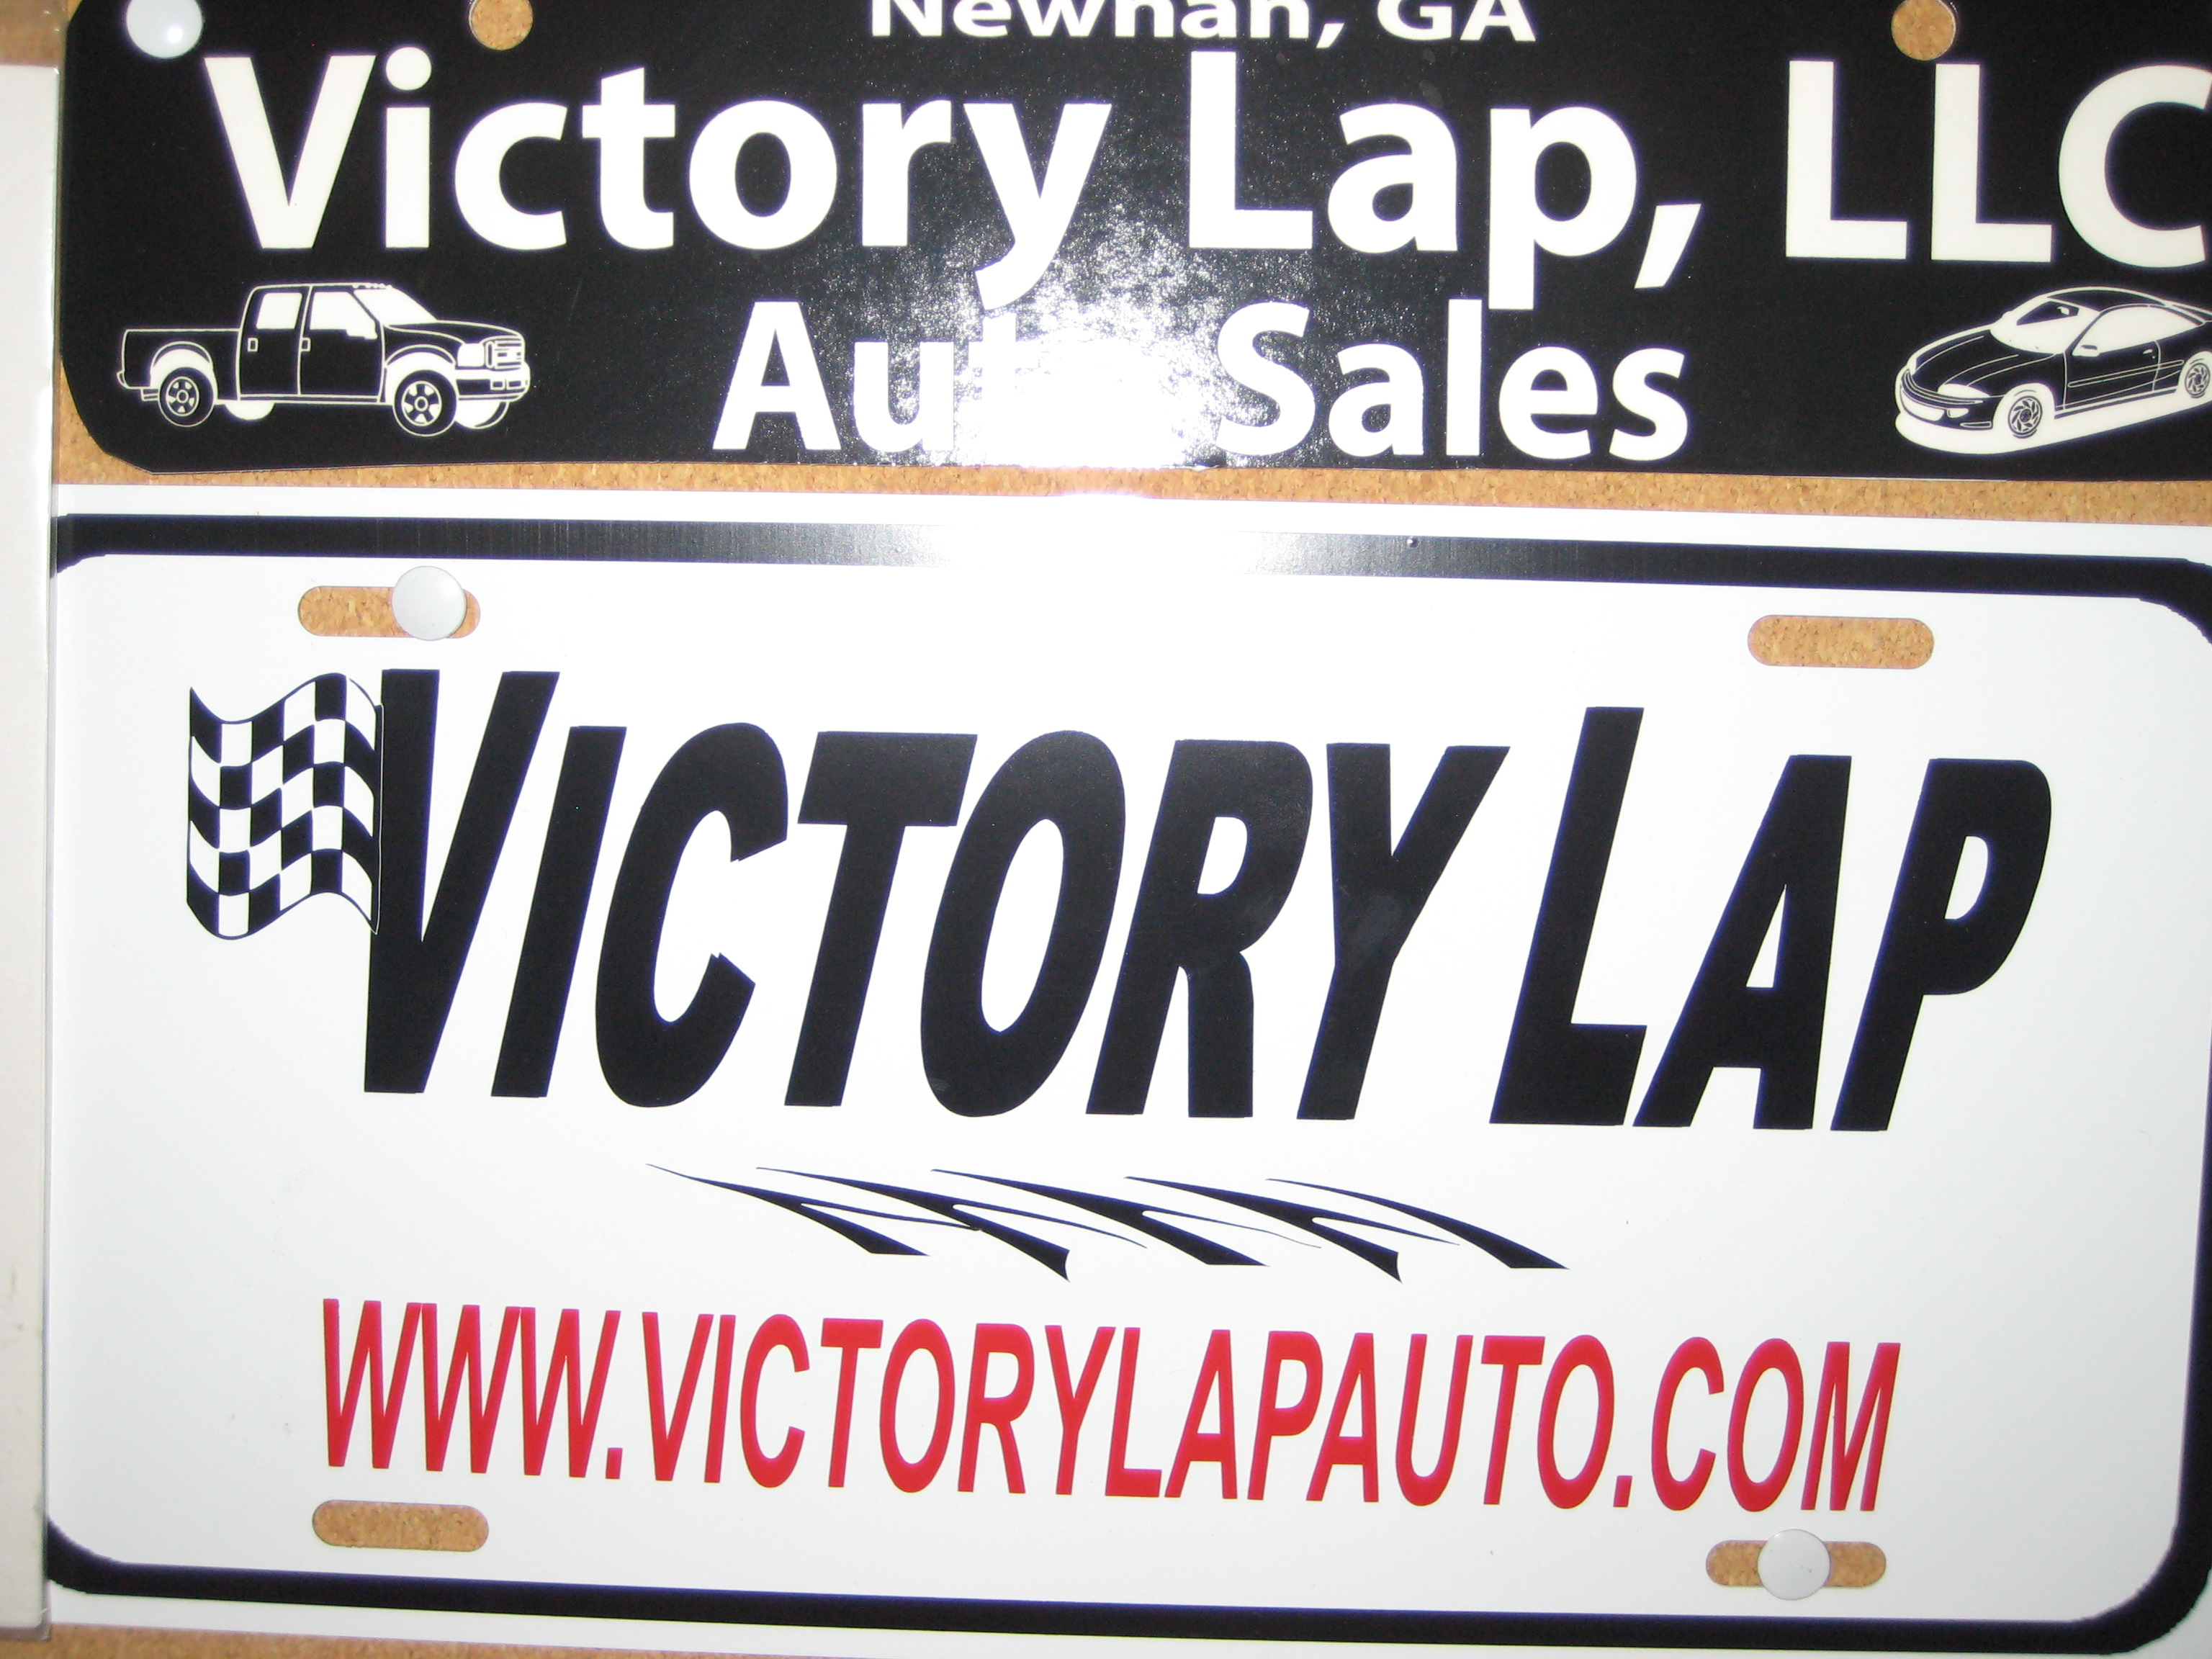 Victory Lap Auto Sales LLC